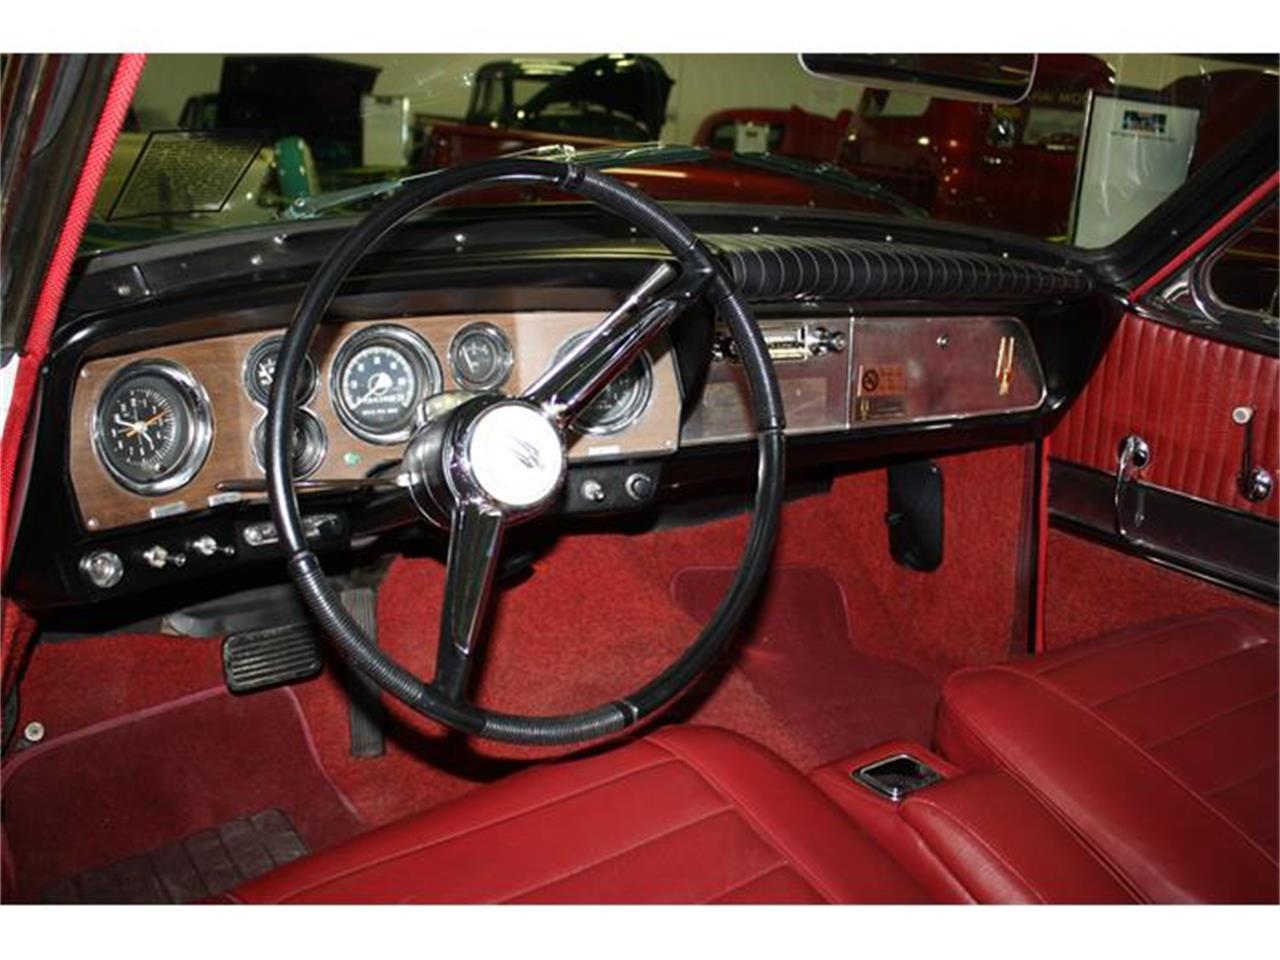 Large Picture of 1962 Gran Turismo located in Missouri - $25,000.00 - EU1C